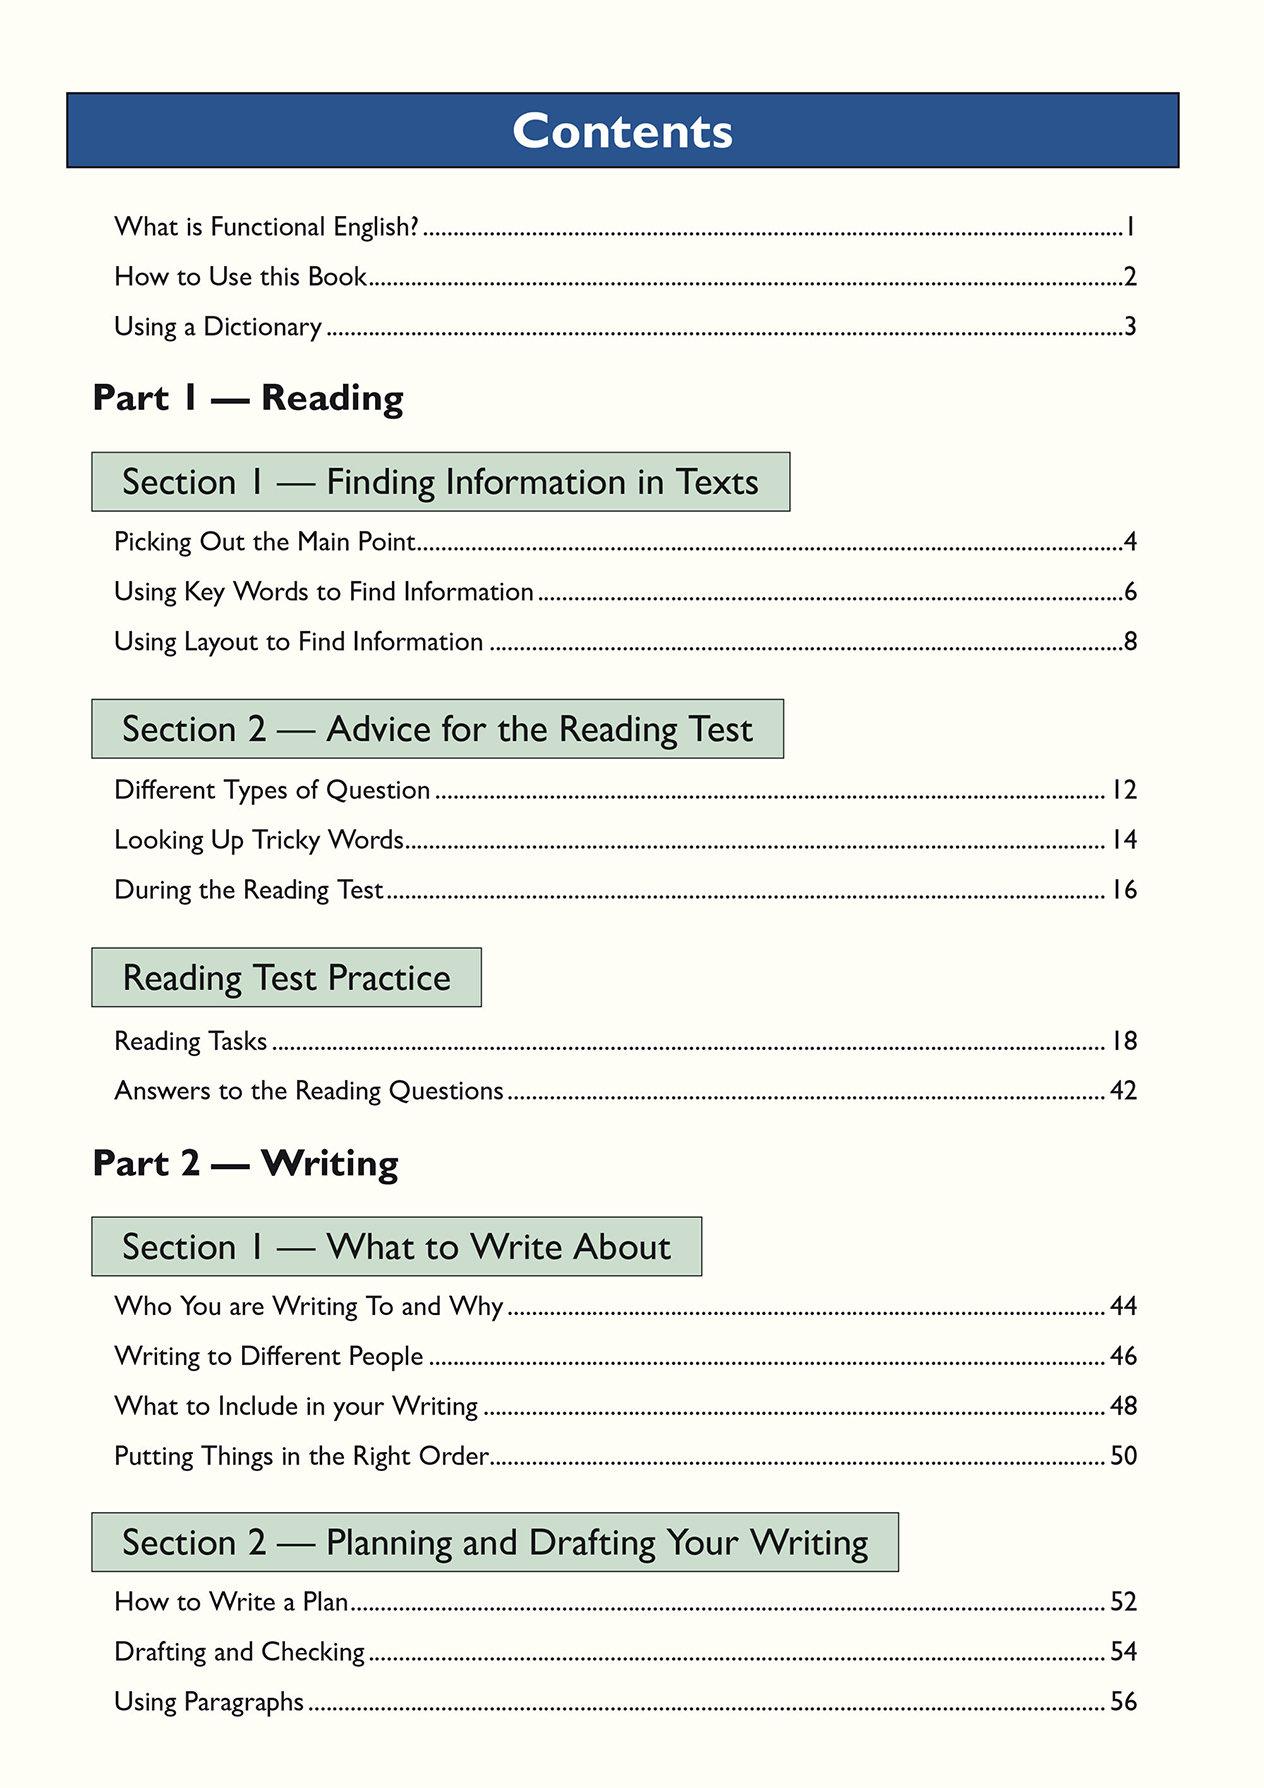 E3SRA2 - Functional Skills English Entry Level 3 - Study & Test Practice